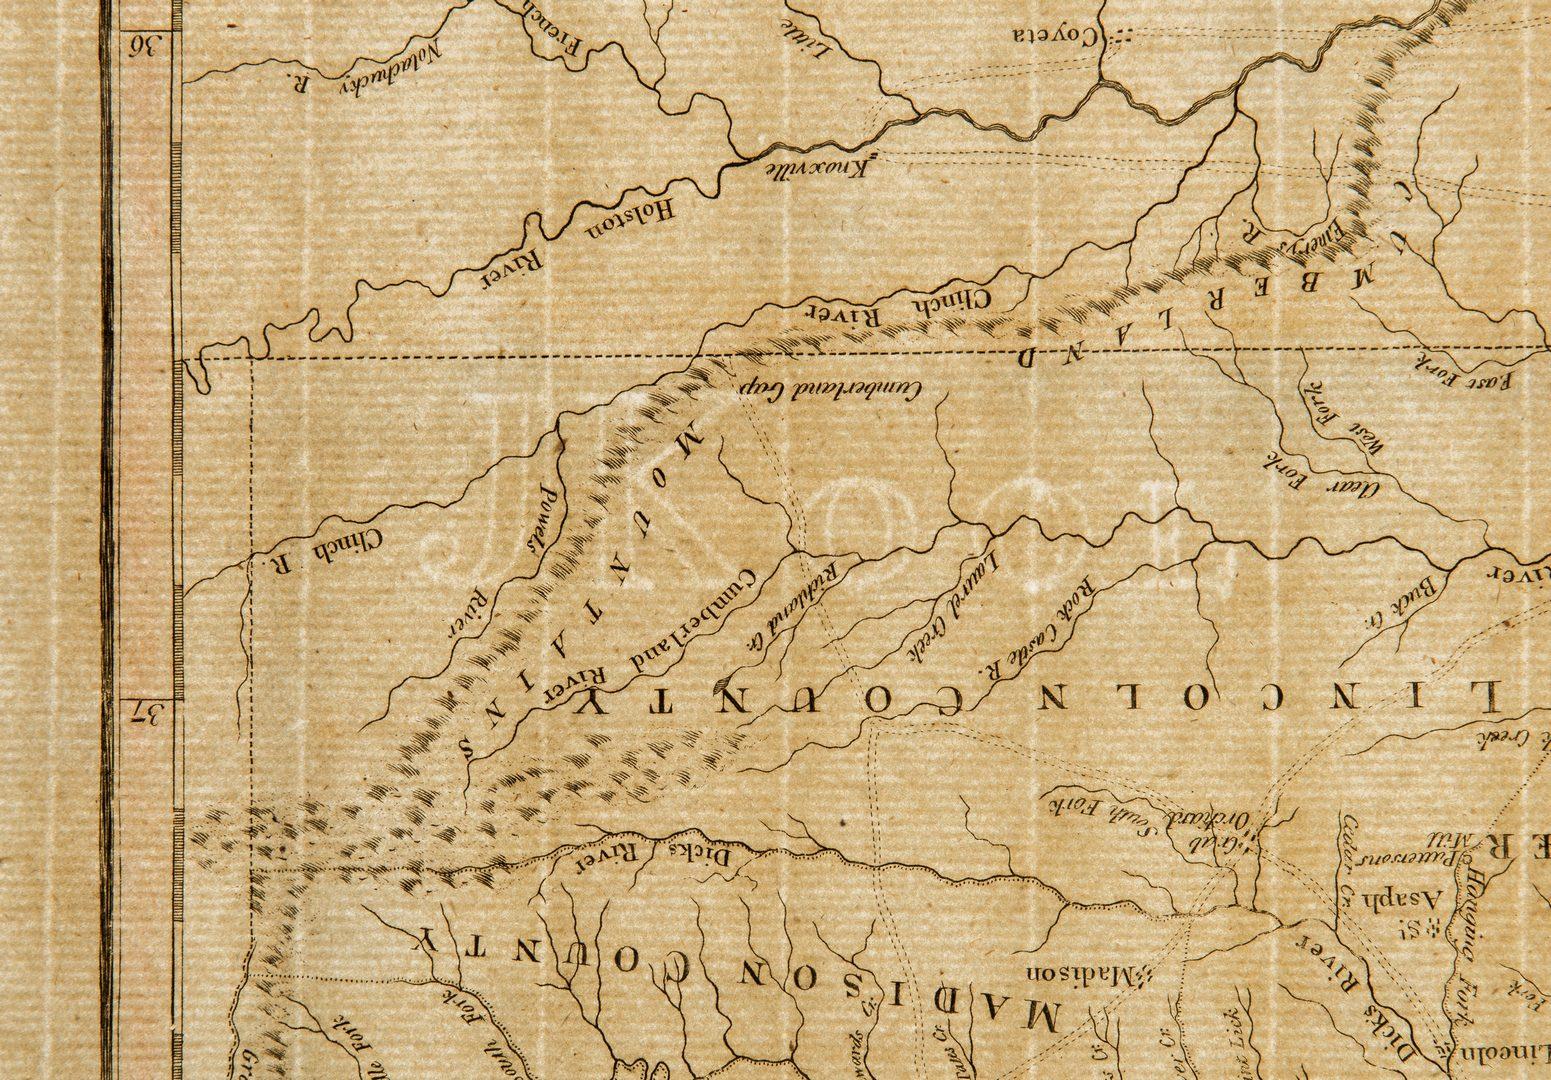 Lot 342: John Reid Kentucky Map, 1795